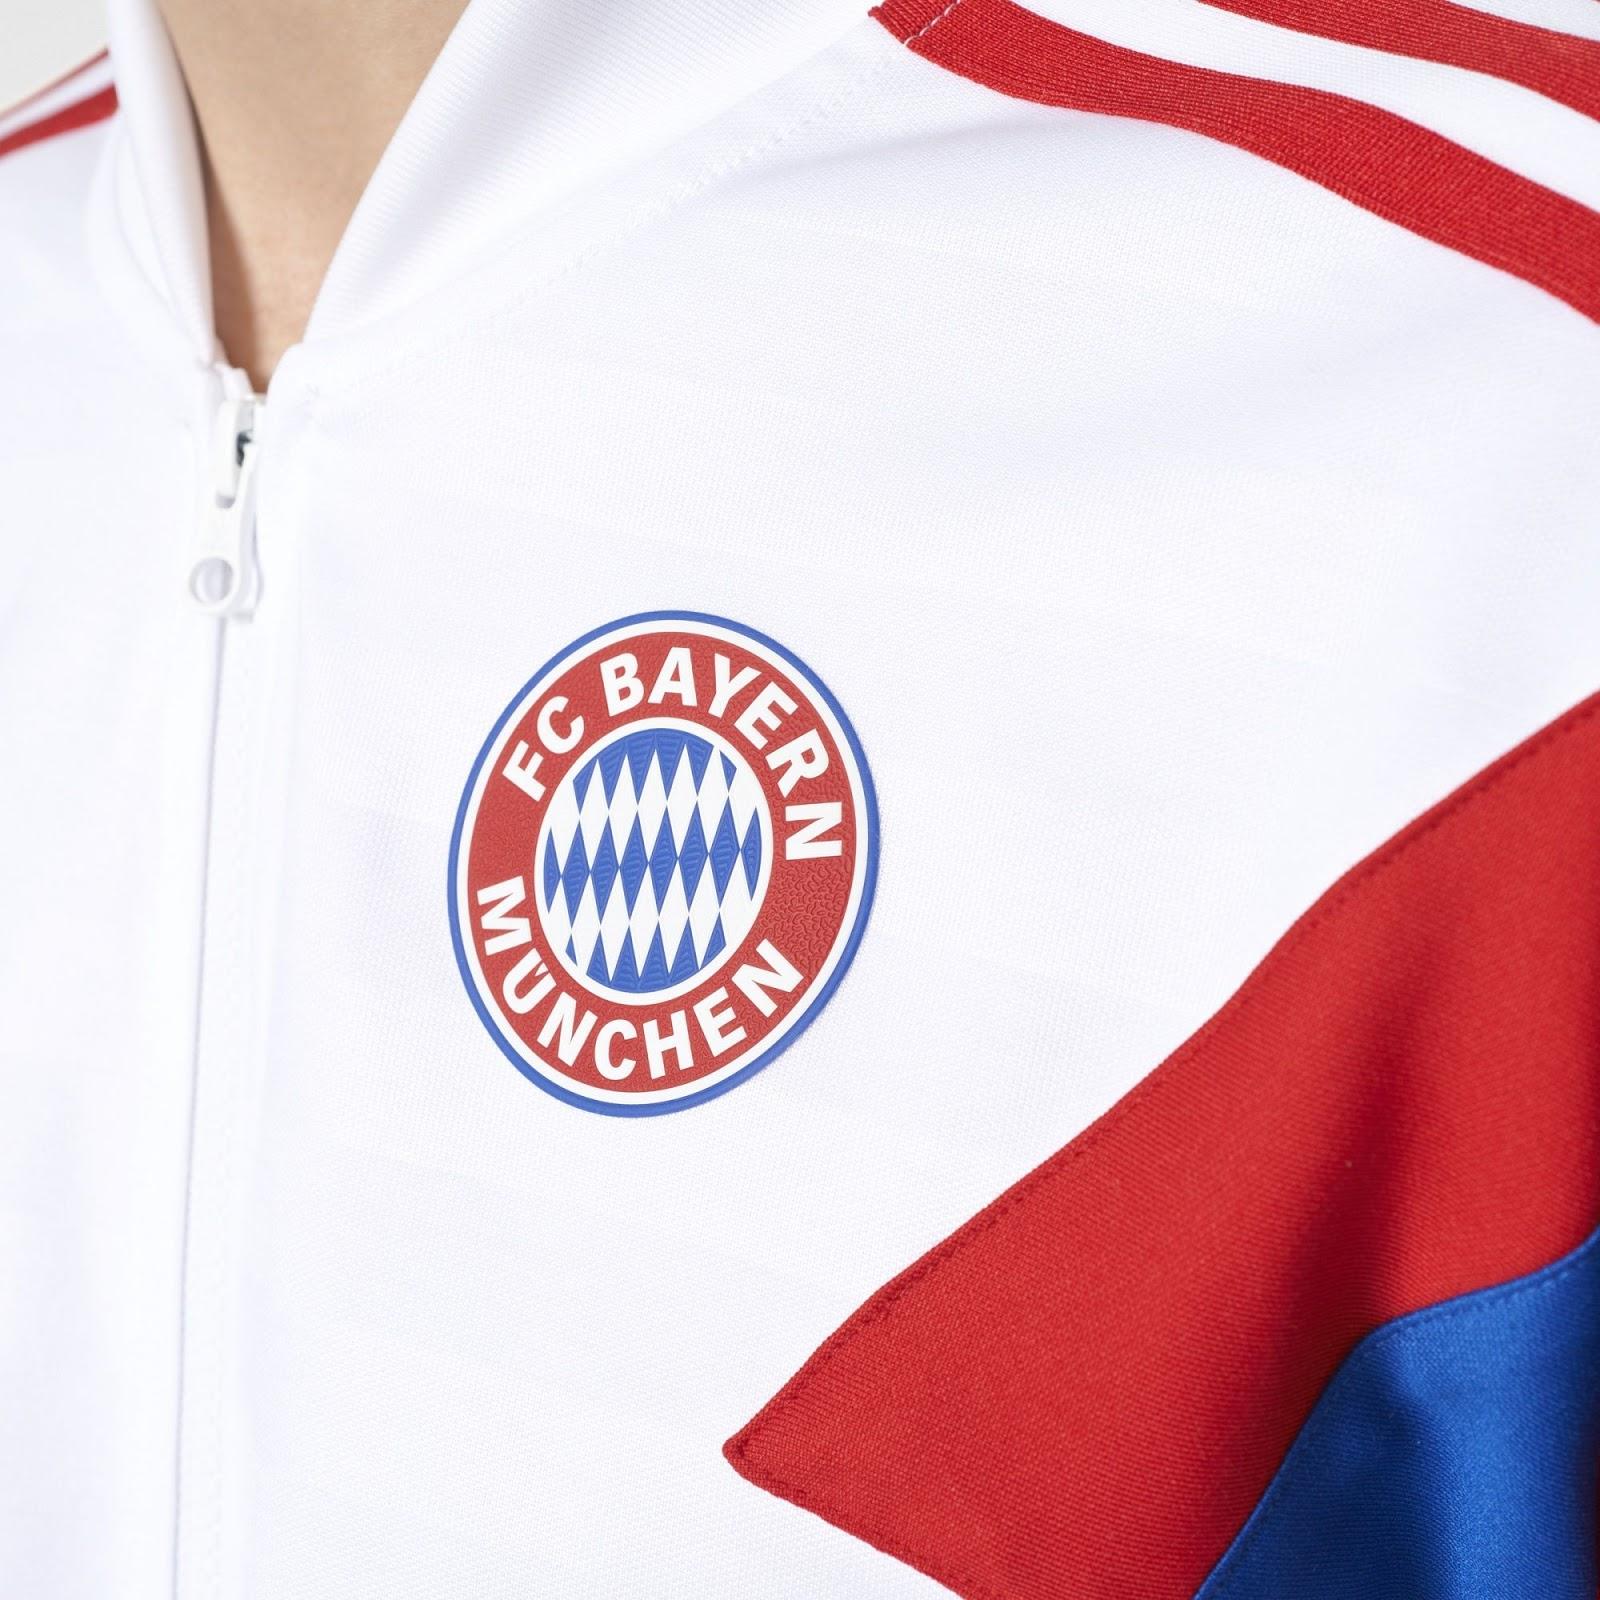 hot sale online b3534 5423b Adidas Originals FC Bayern München 2017-18 Track Jacket ...